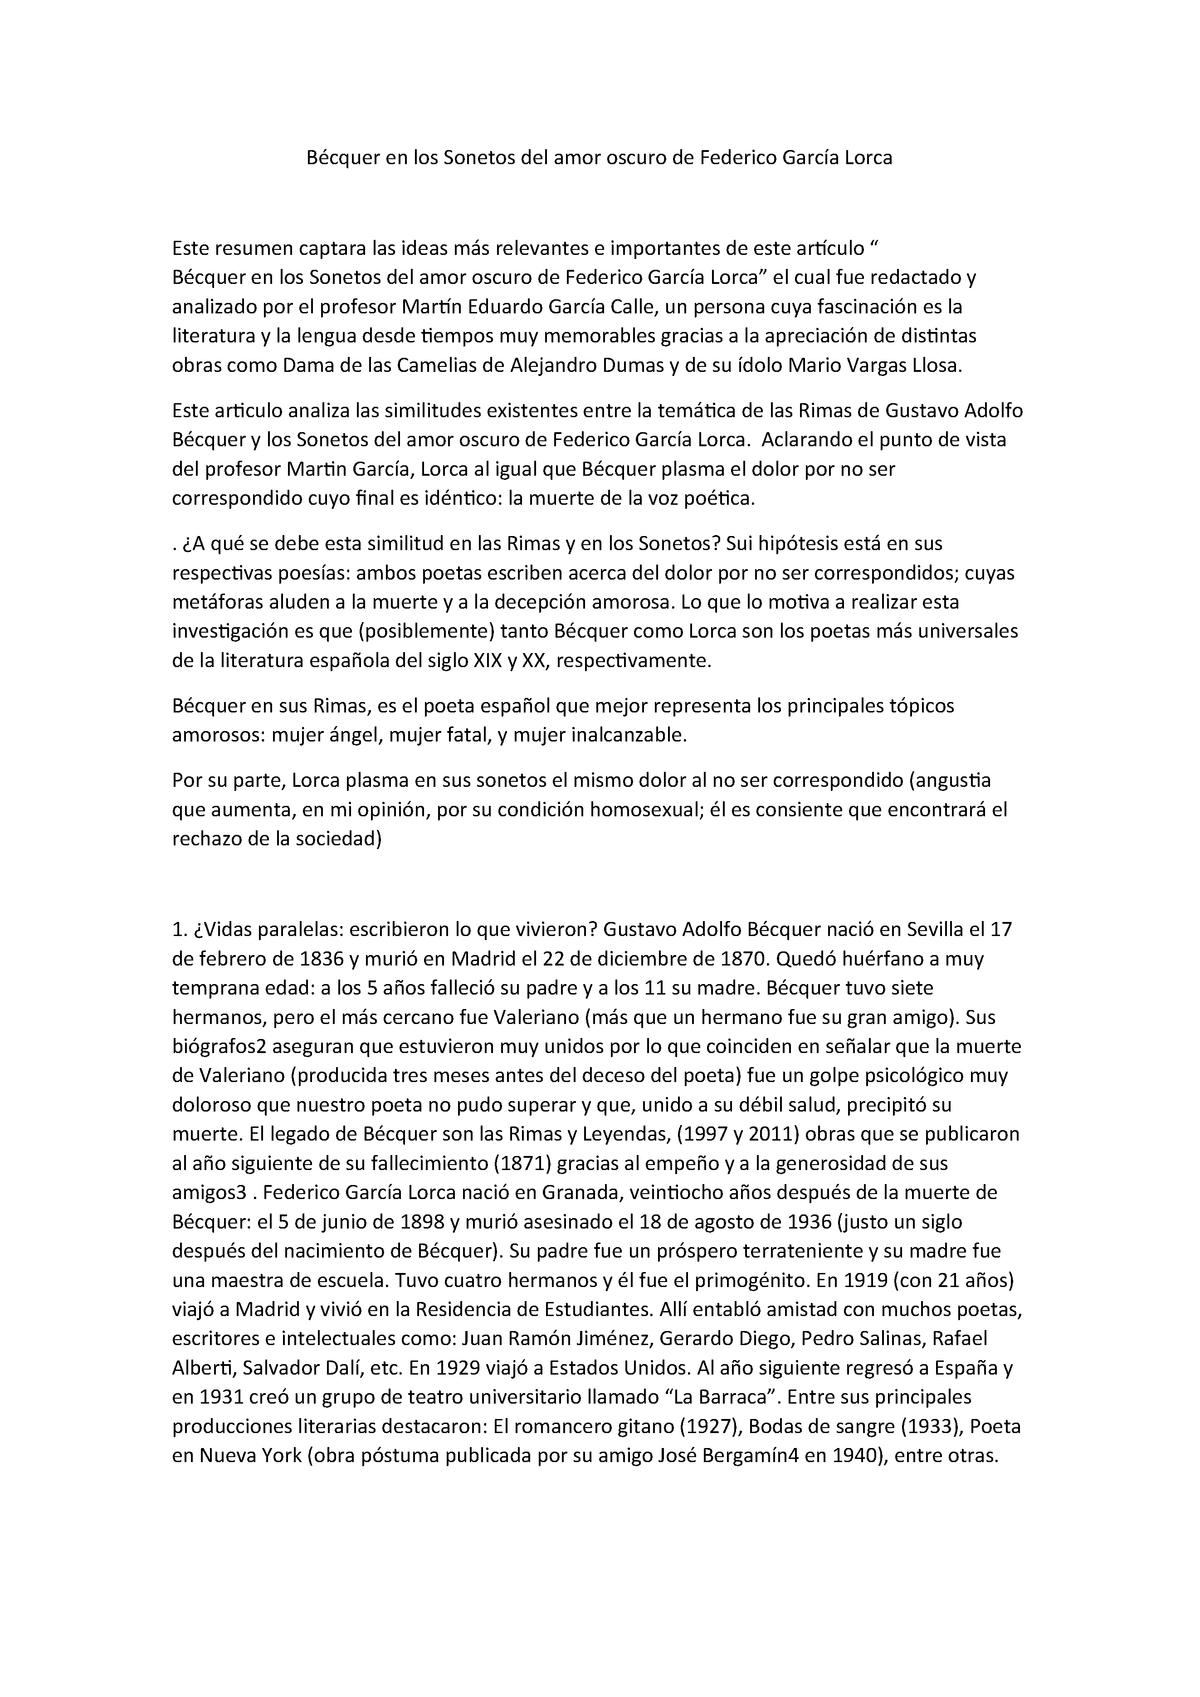 Relación Descomunal Entre Bécquer Y Lorca Ed1326 Unp